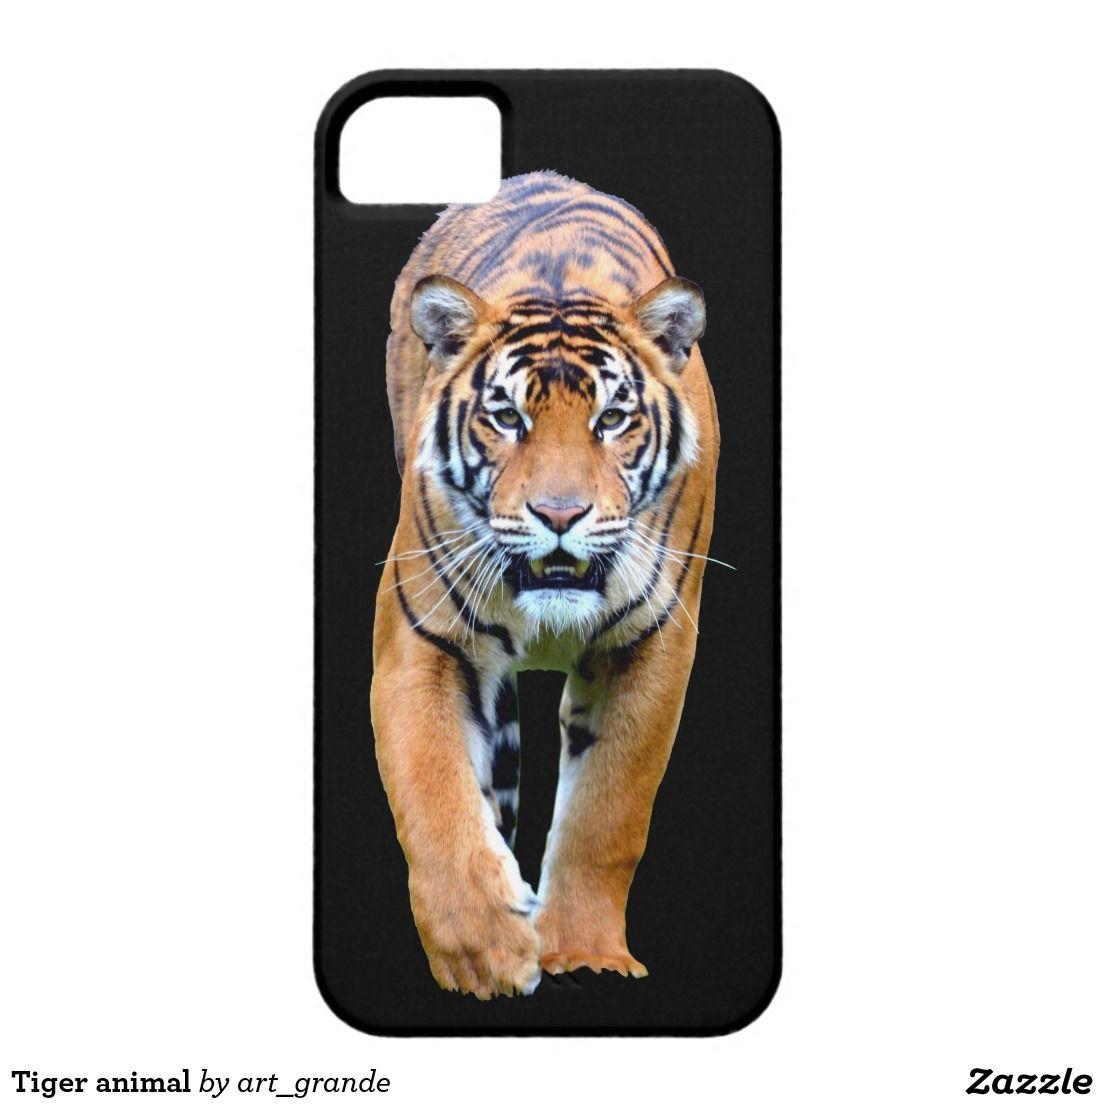 Tiger animal iPhone SE/5/5s case